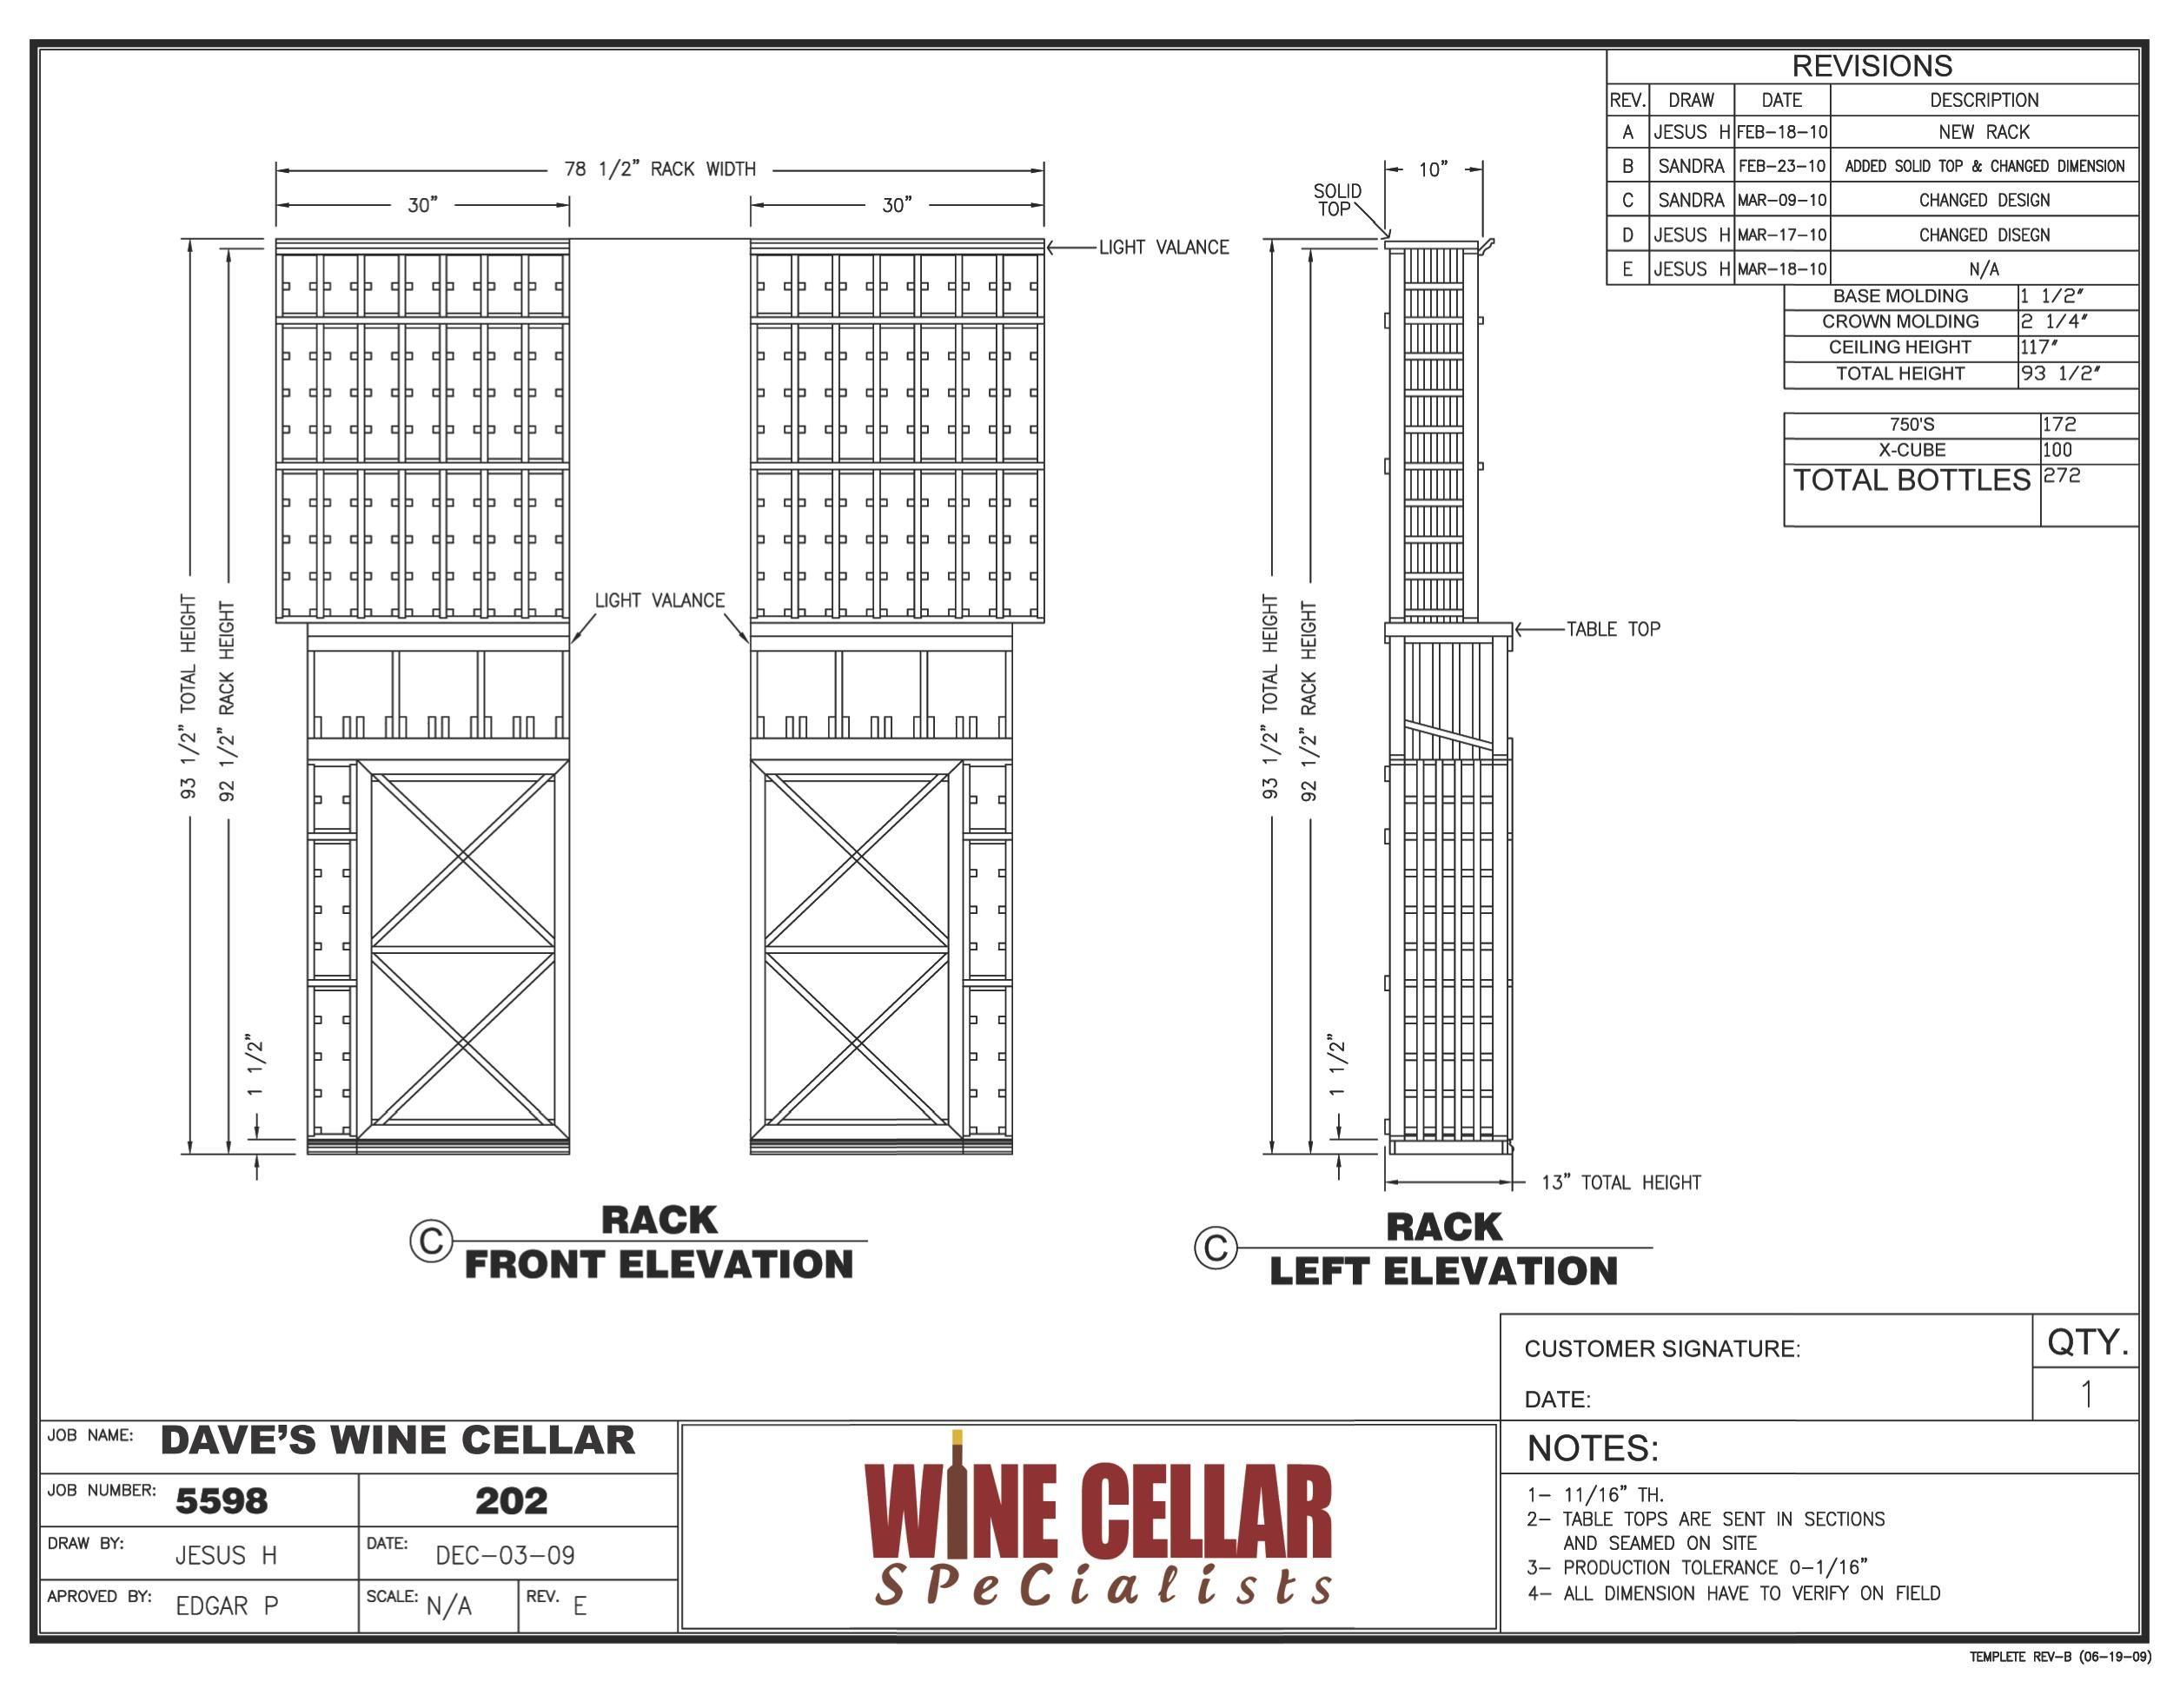 Pin by WineCellar Specialists on Custom Wine Cellar Palos